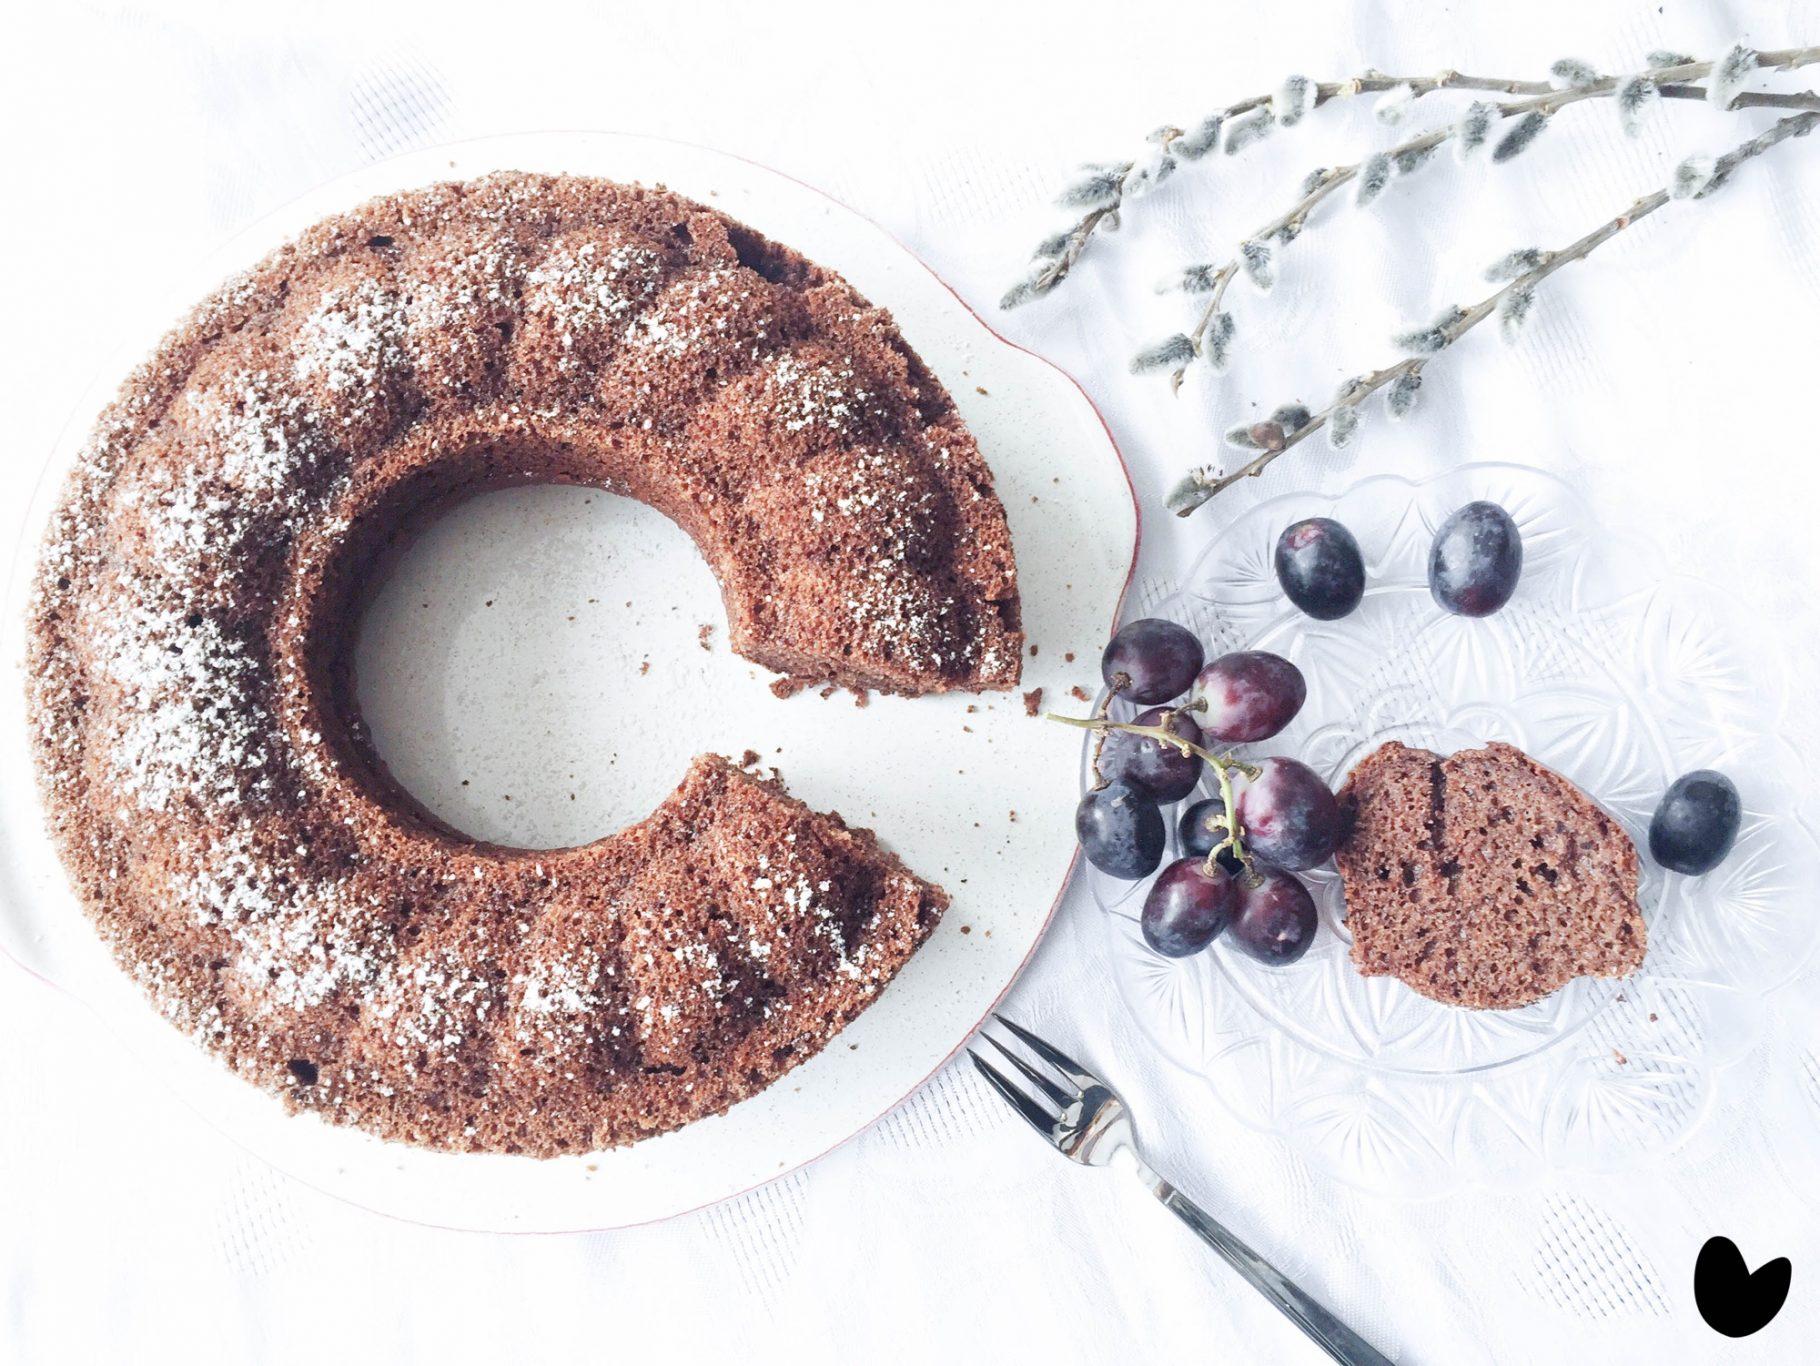 Becherkuchen mit Schokolade-Mohn-Geschmack